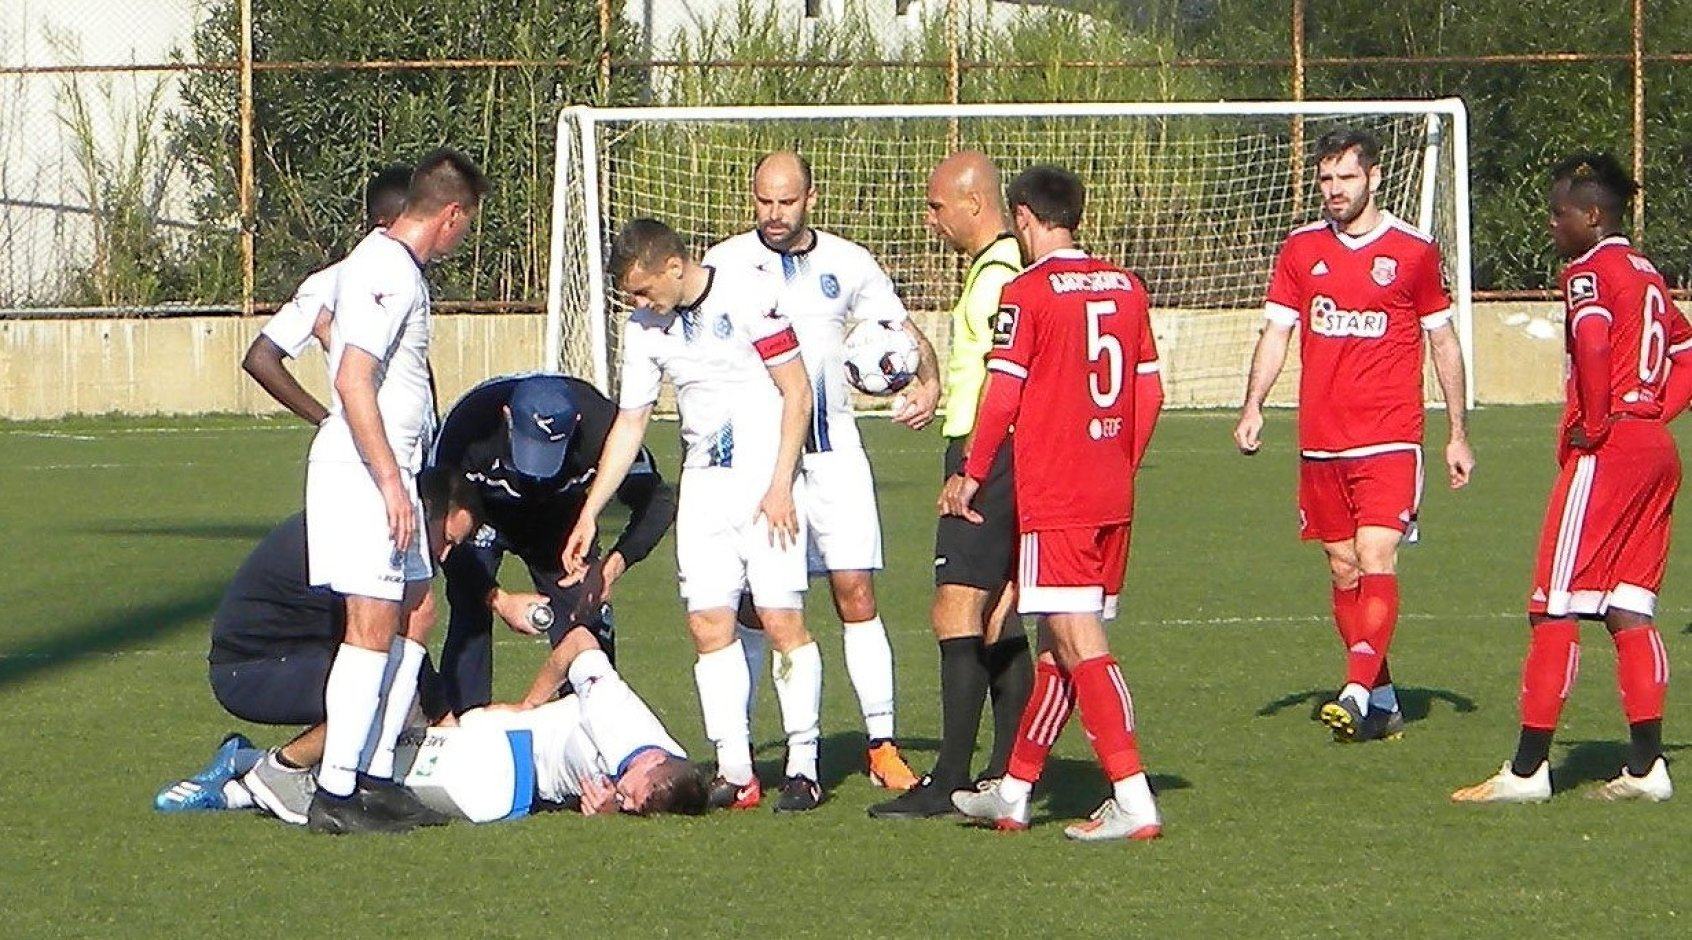 Севилья 3 0 боруссия м обзор матча